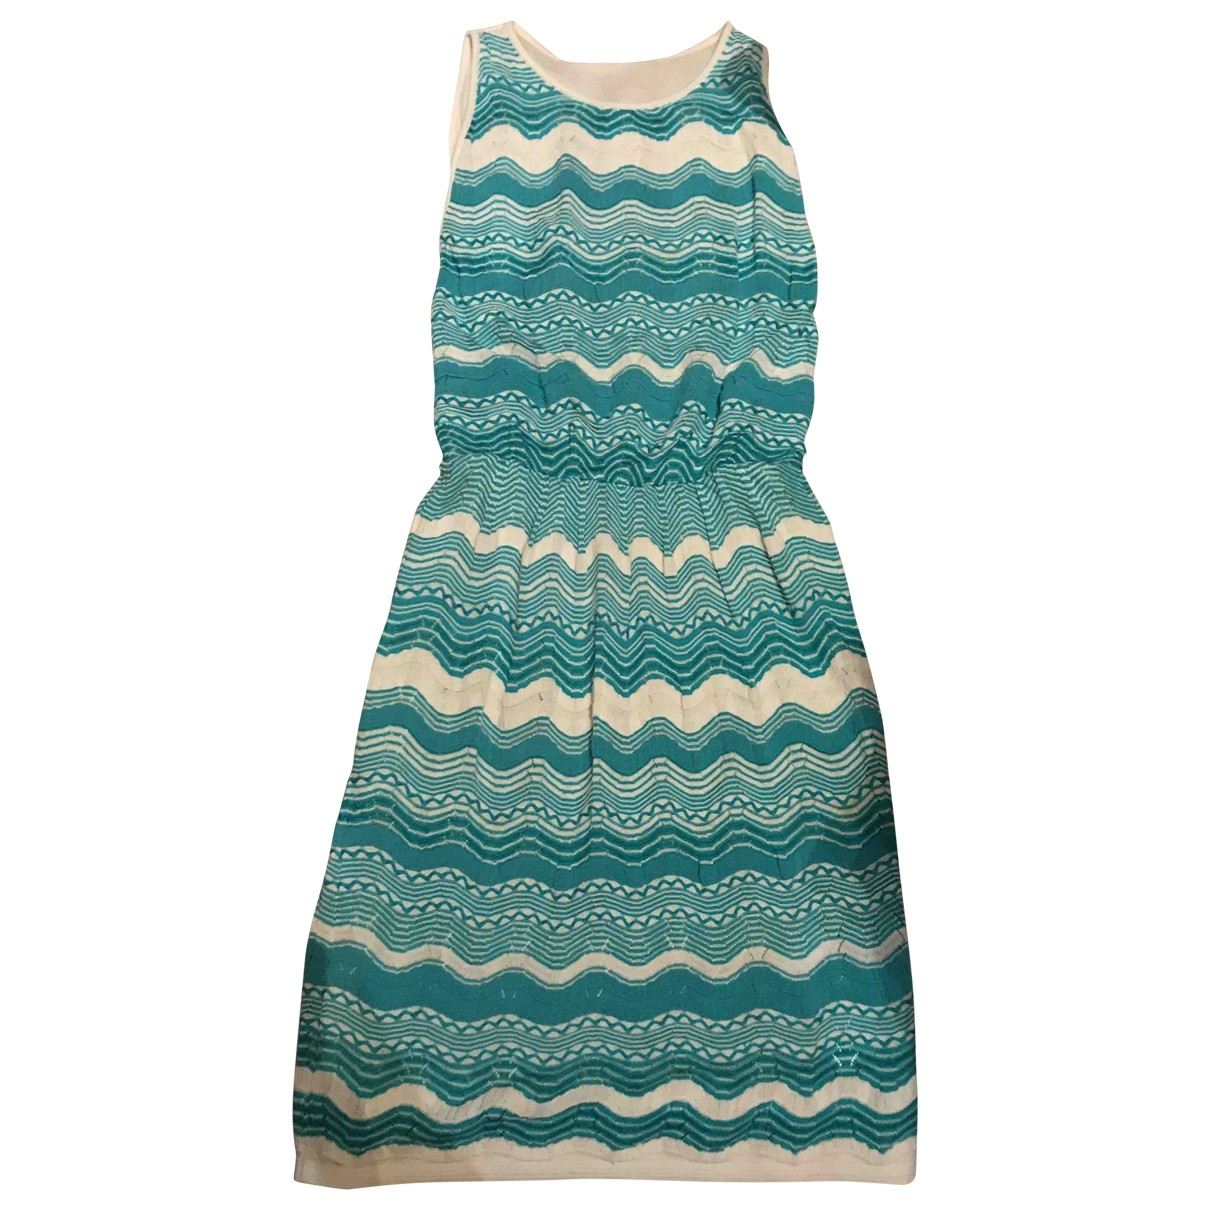 M Missoni \N Turquoise Cotton dress for Women 38 FR